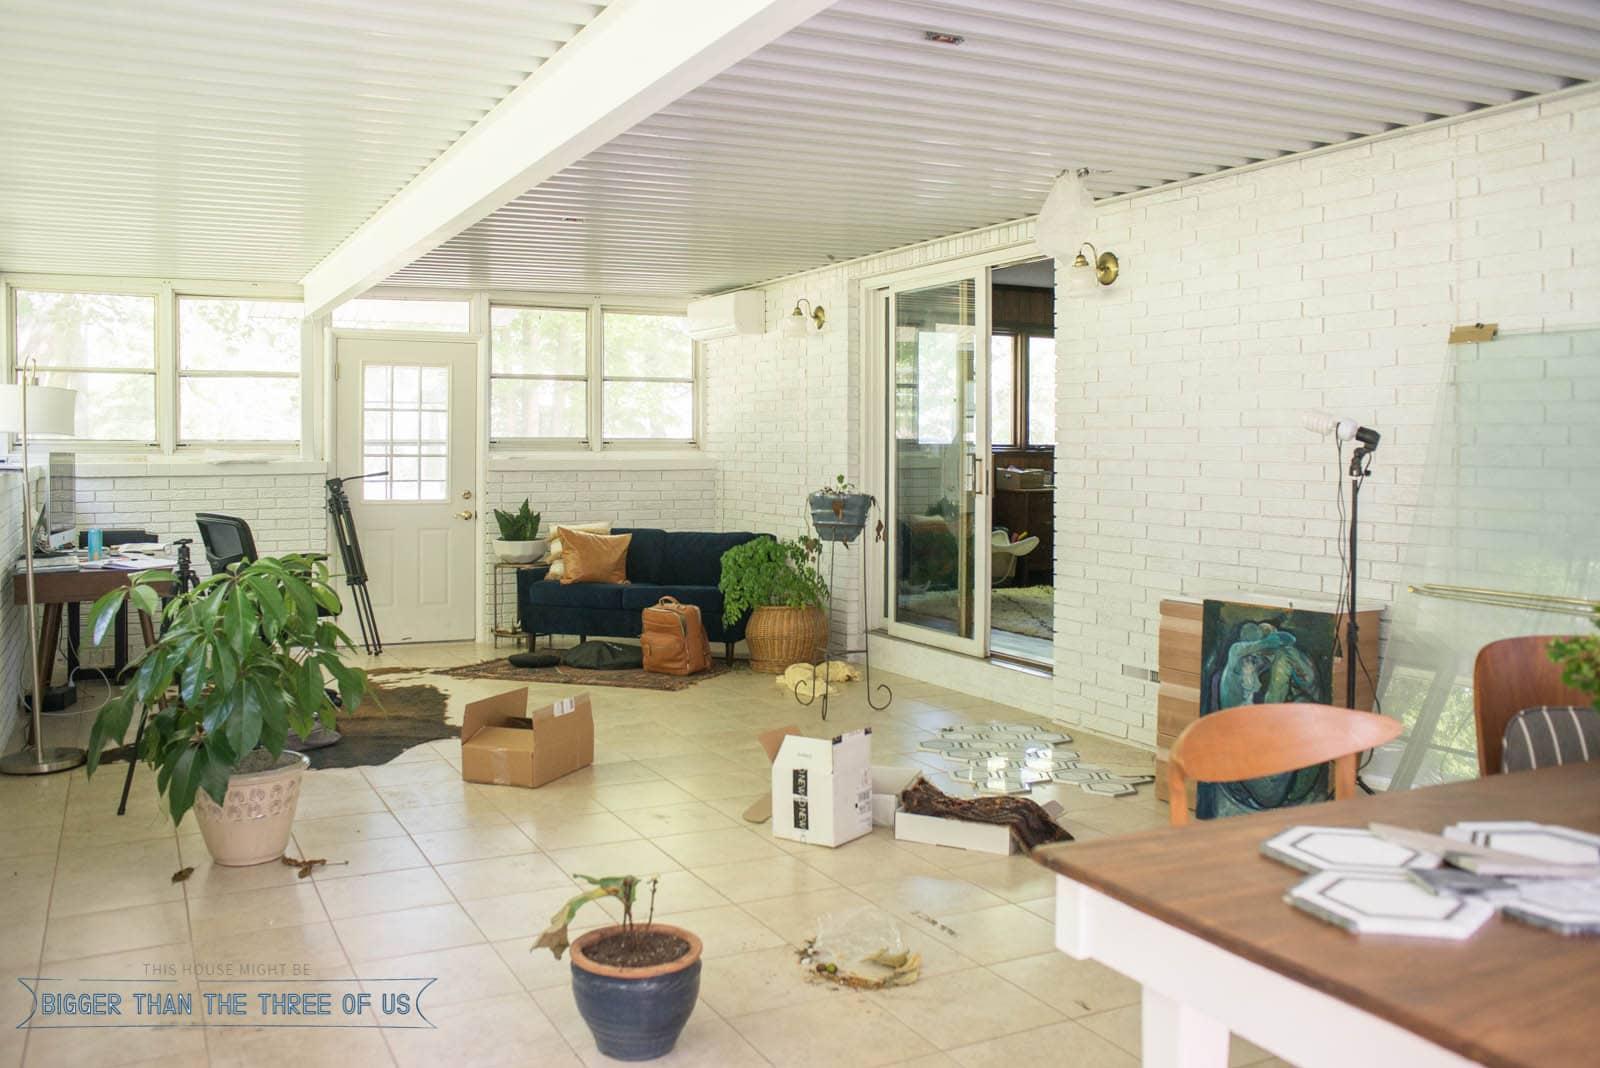 Sunroom turned office - behind the scenes of how it always looks